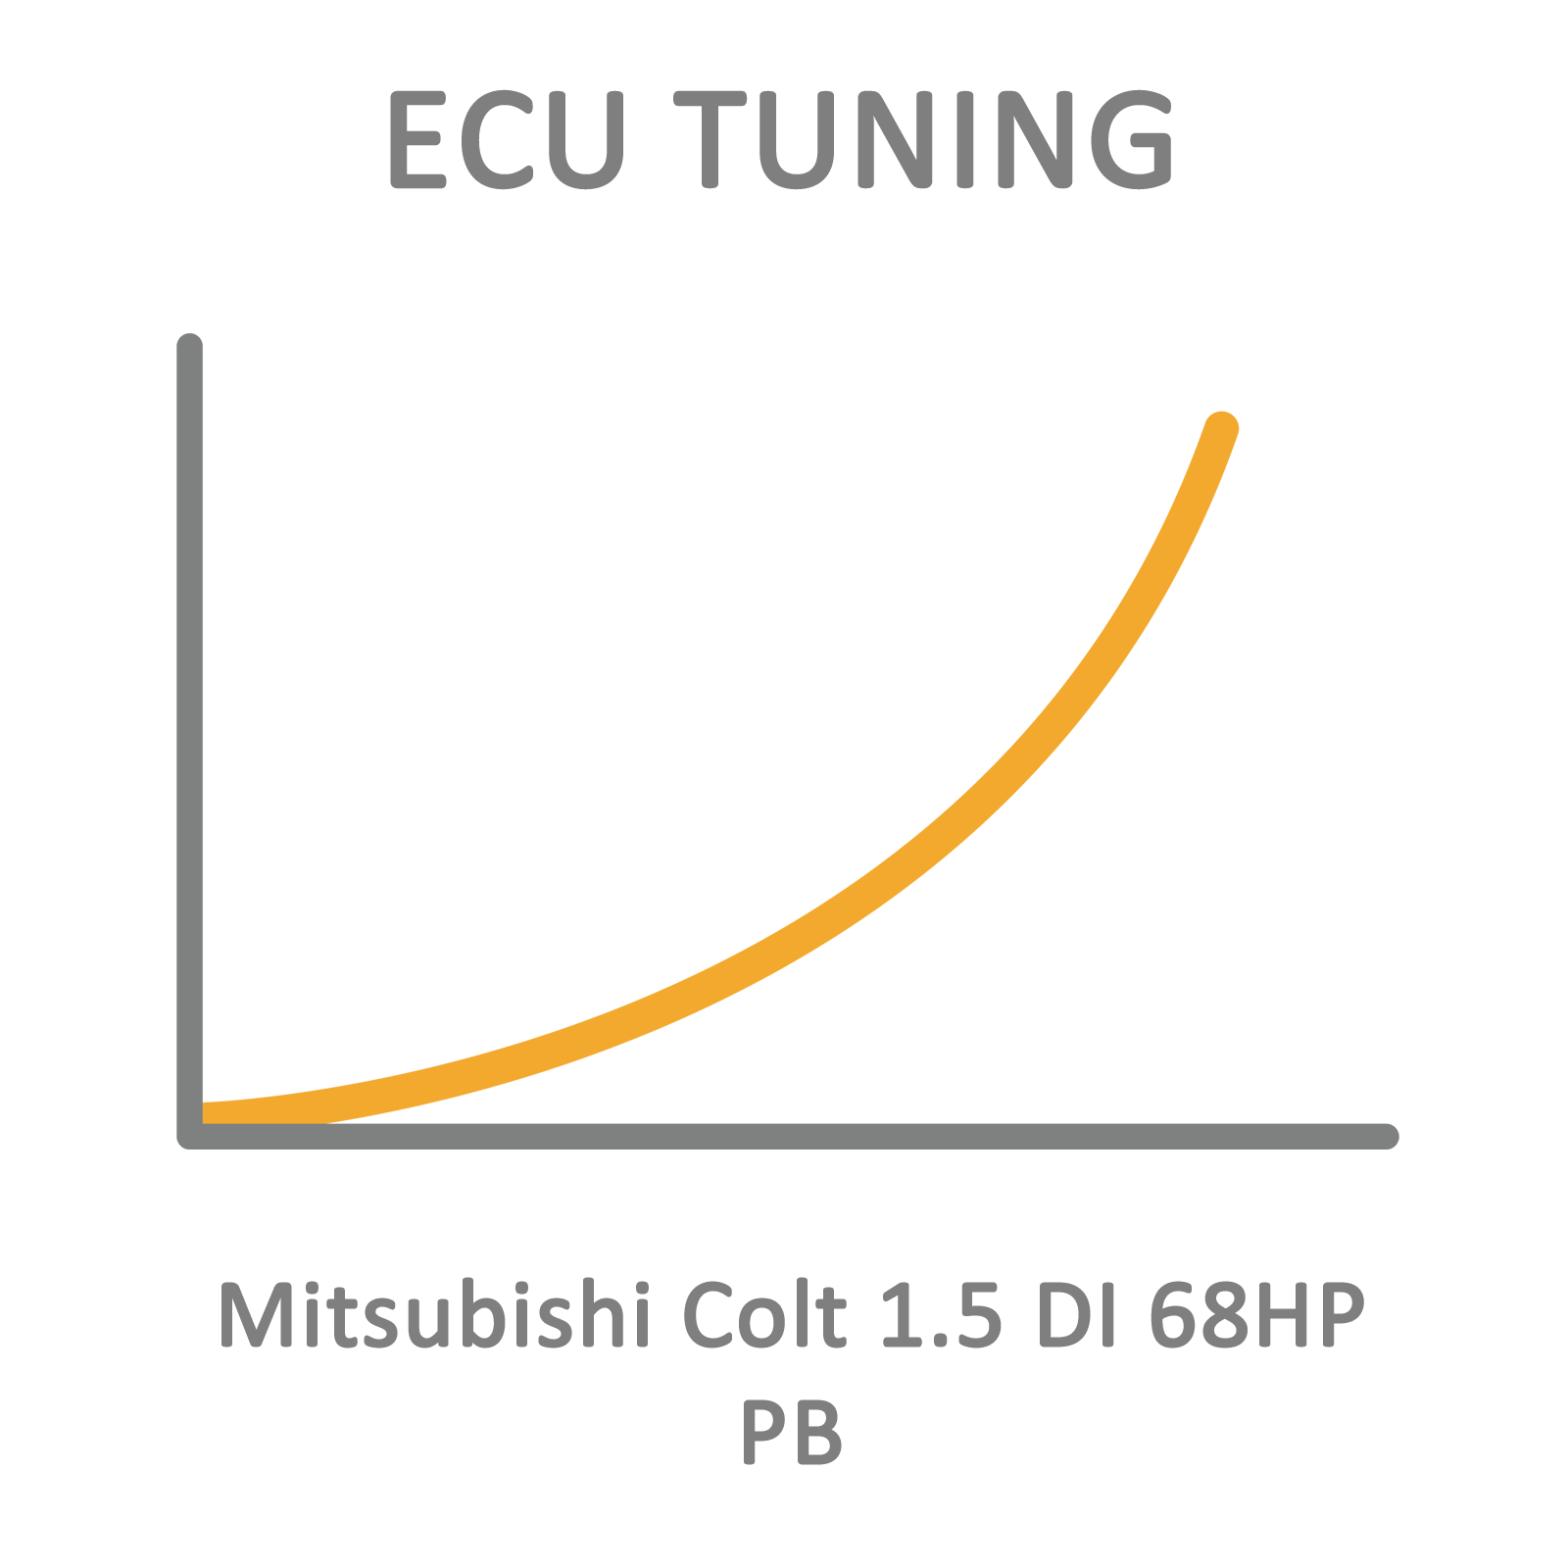 Mitsubishi Colt 1.5 DI 68HP PB ECU Tuning Remapping